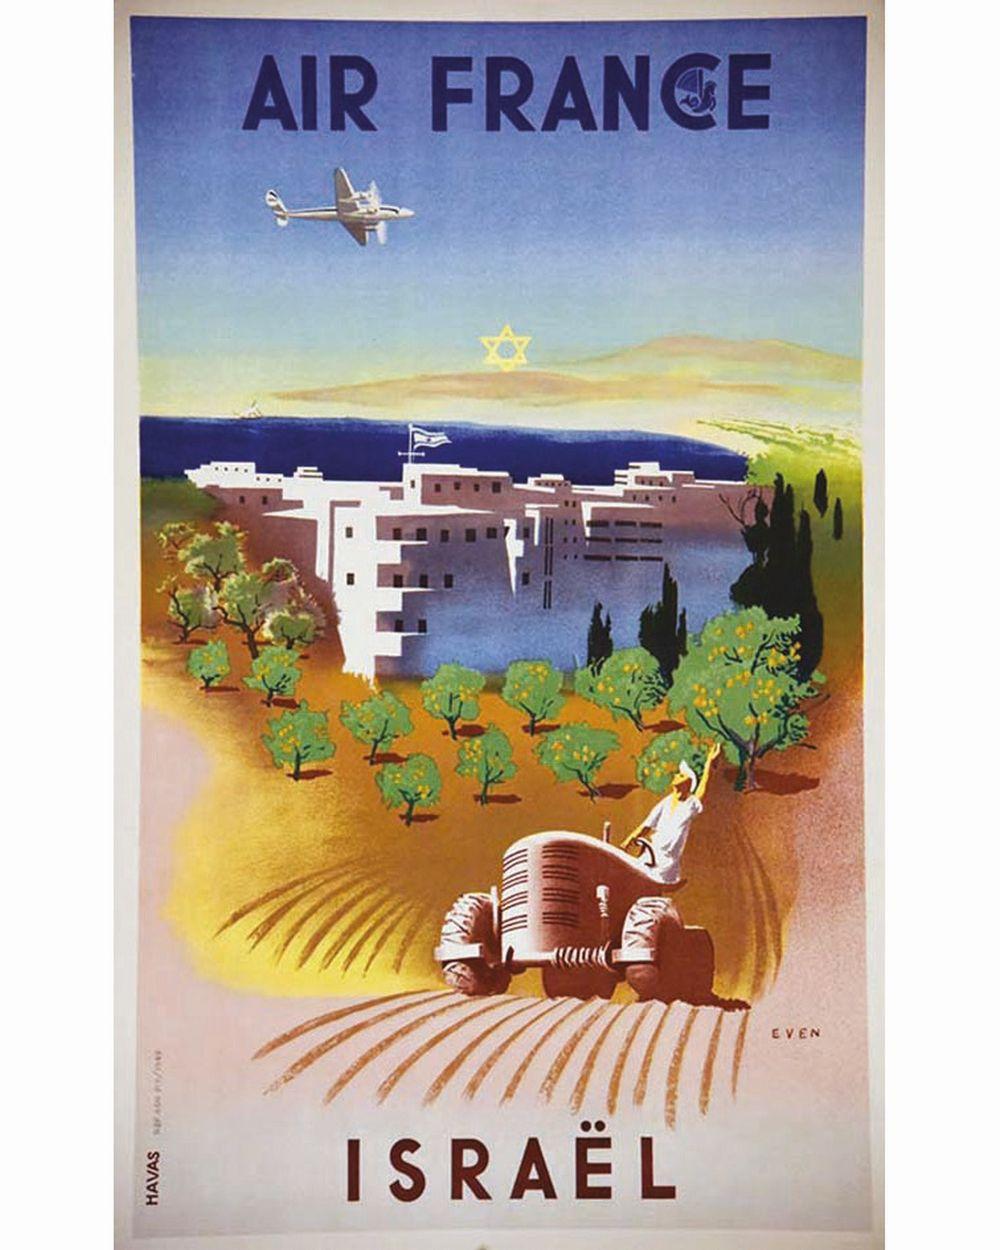 EVEN - Israël Air France     1949